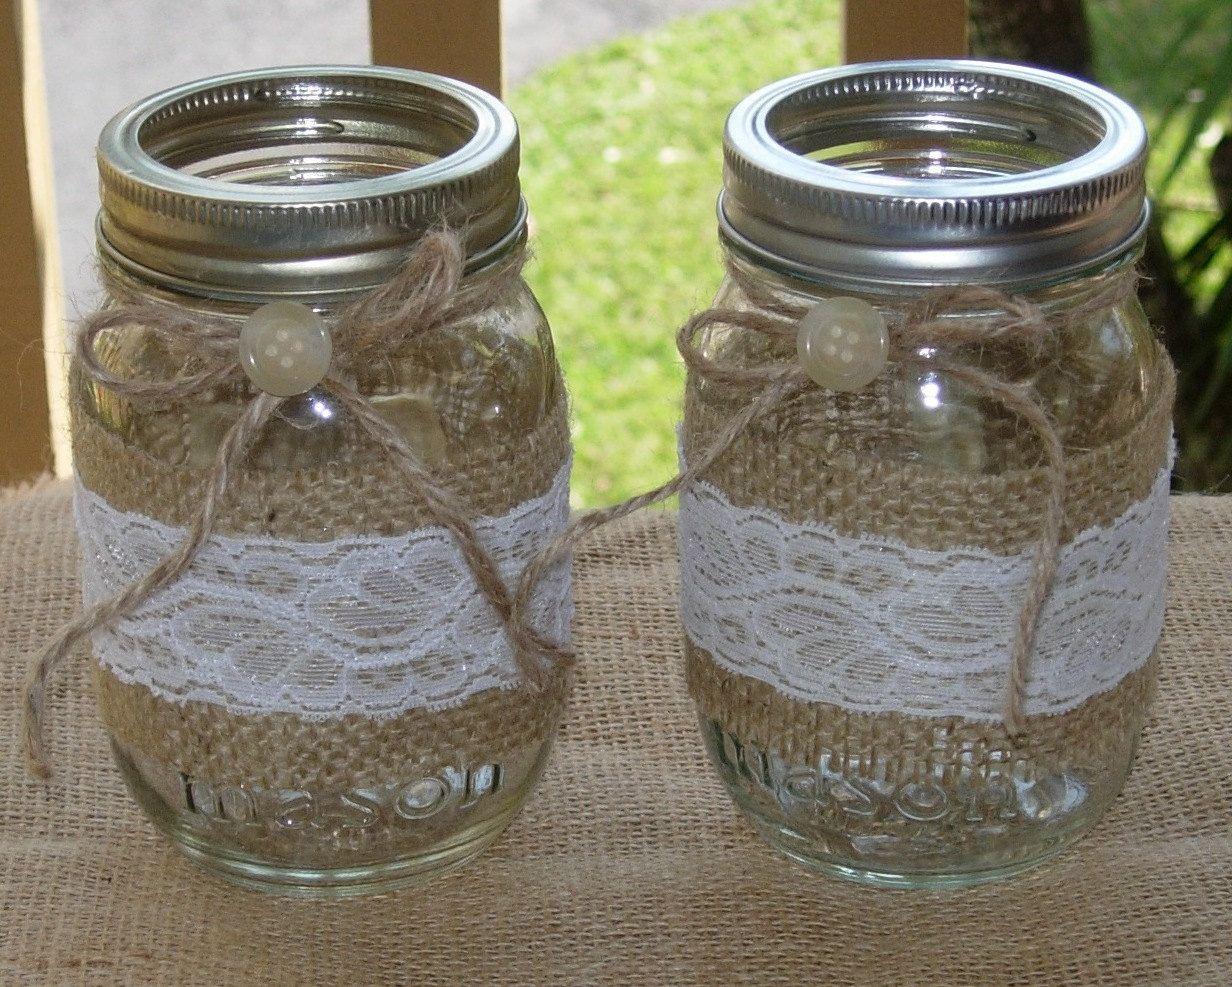 Burlap and Lace Mason Jar candle by